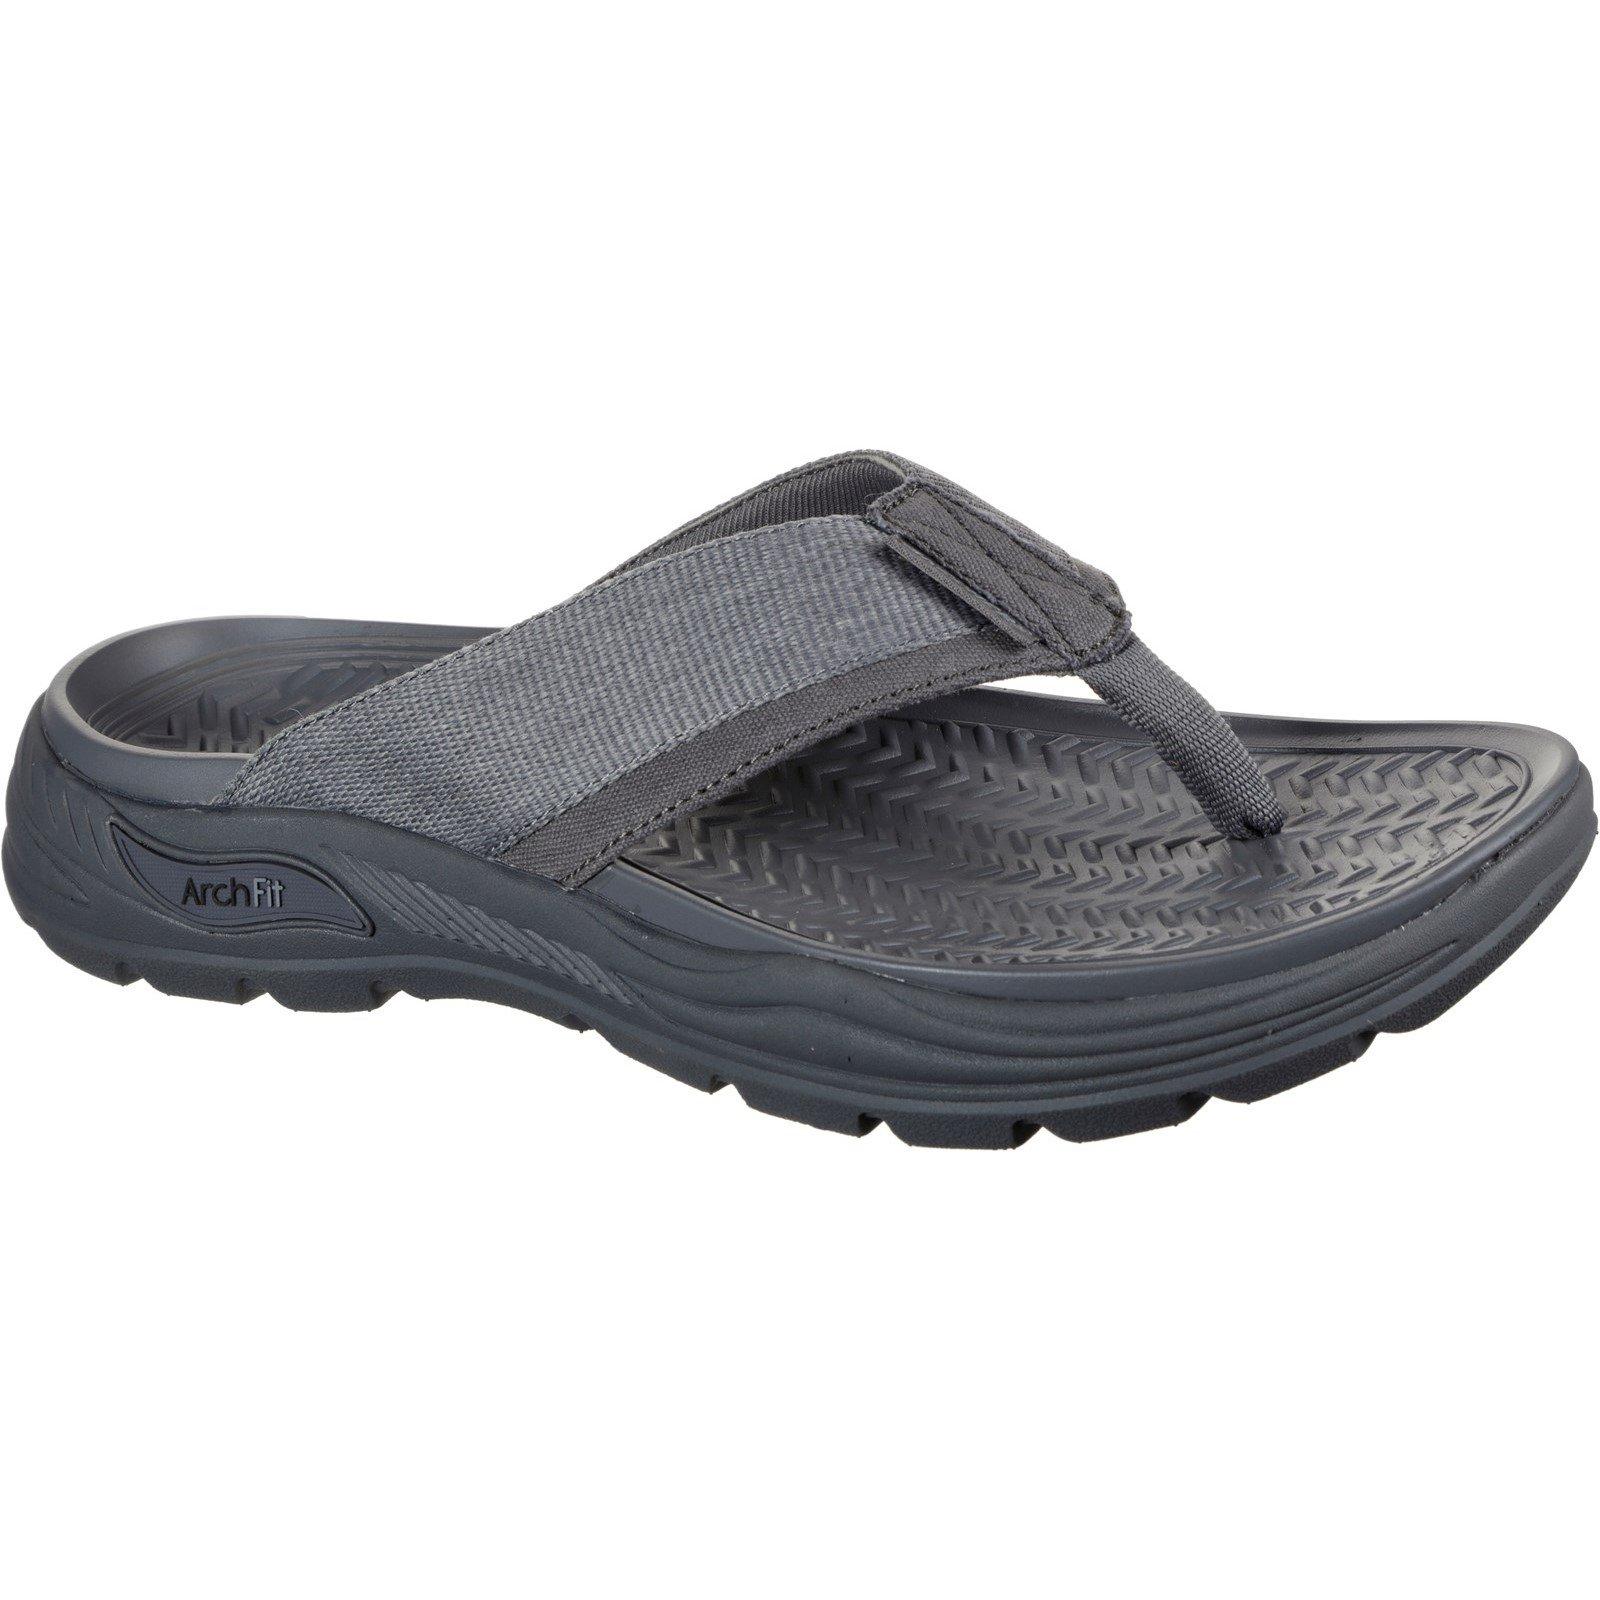 Skechers Men's Arch Fit Motley Dolano Summer Sandal Charcoal 32209 - Charcoal 6